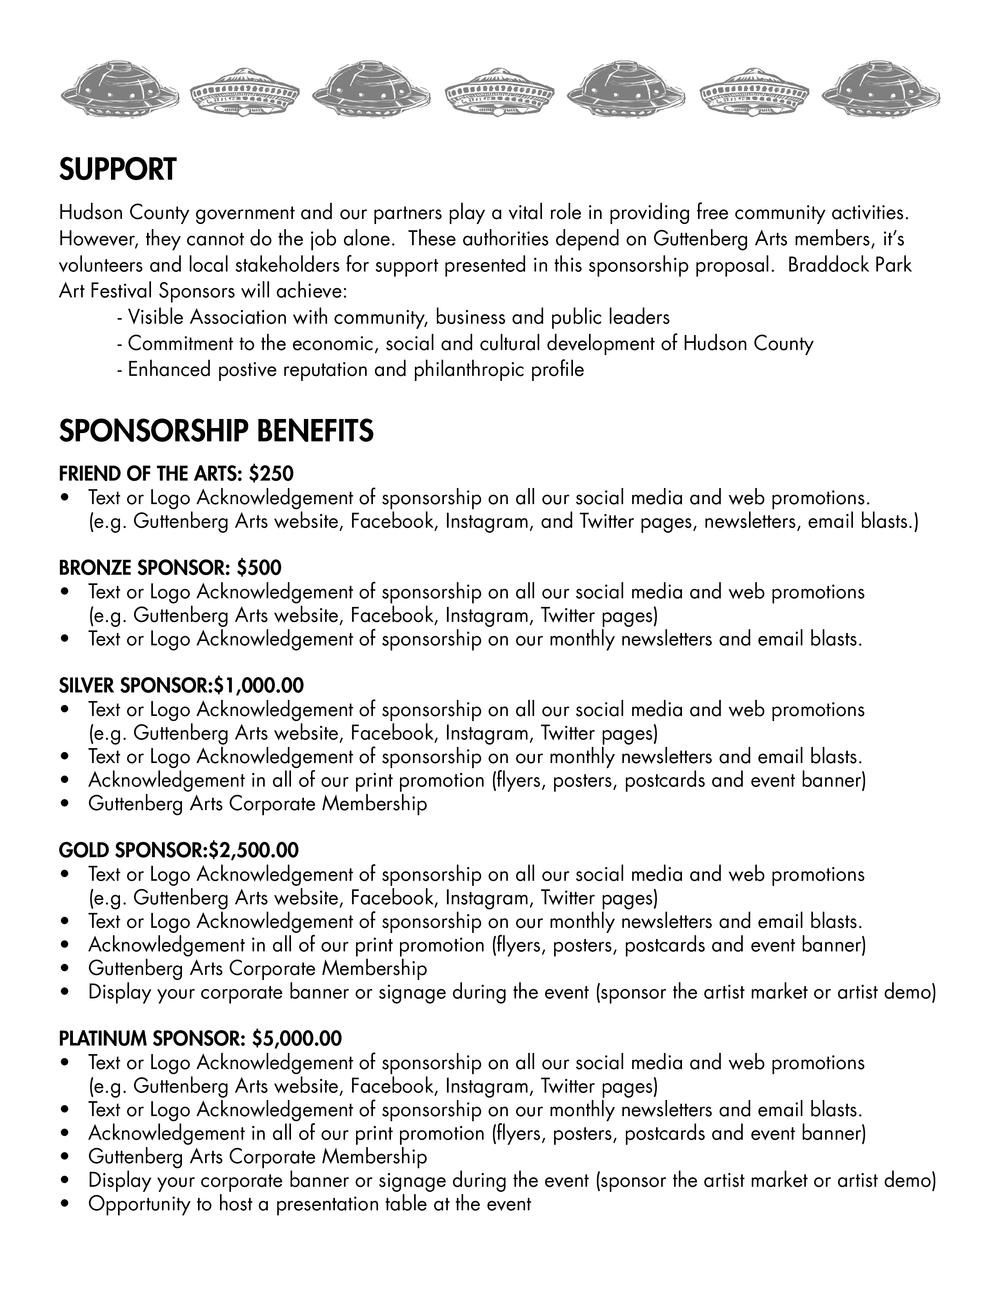 BPAF2015 Corporate Sponsorship v35.jpg